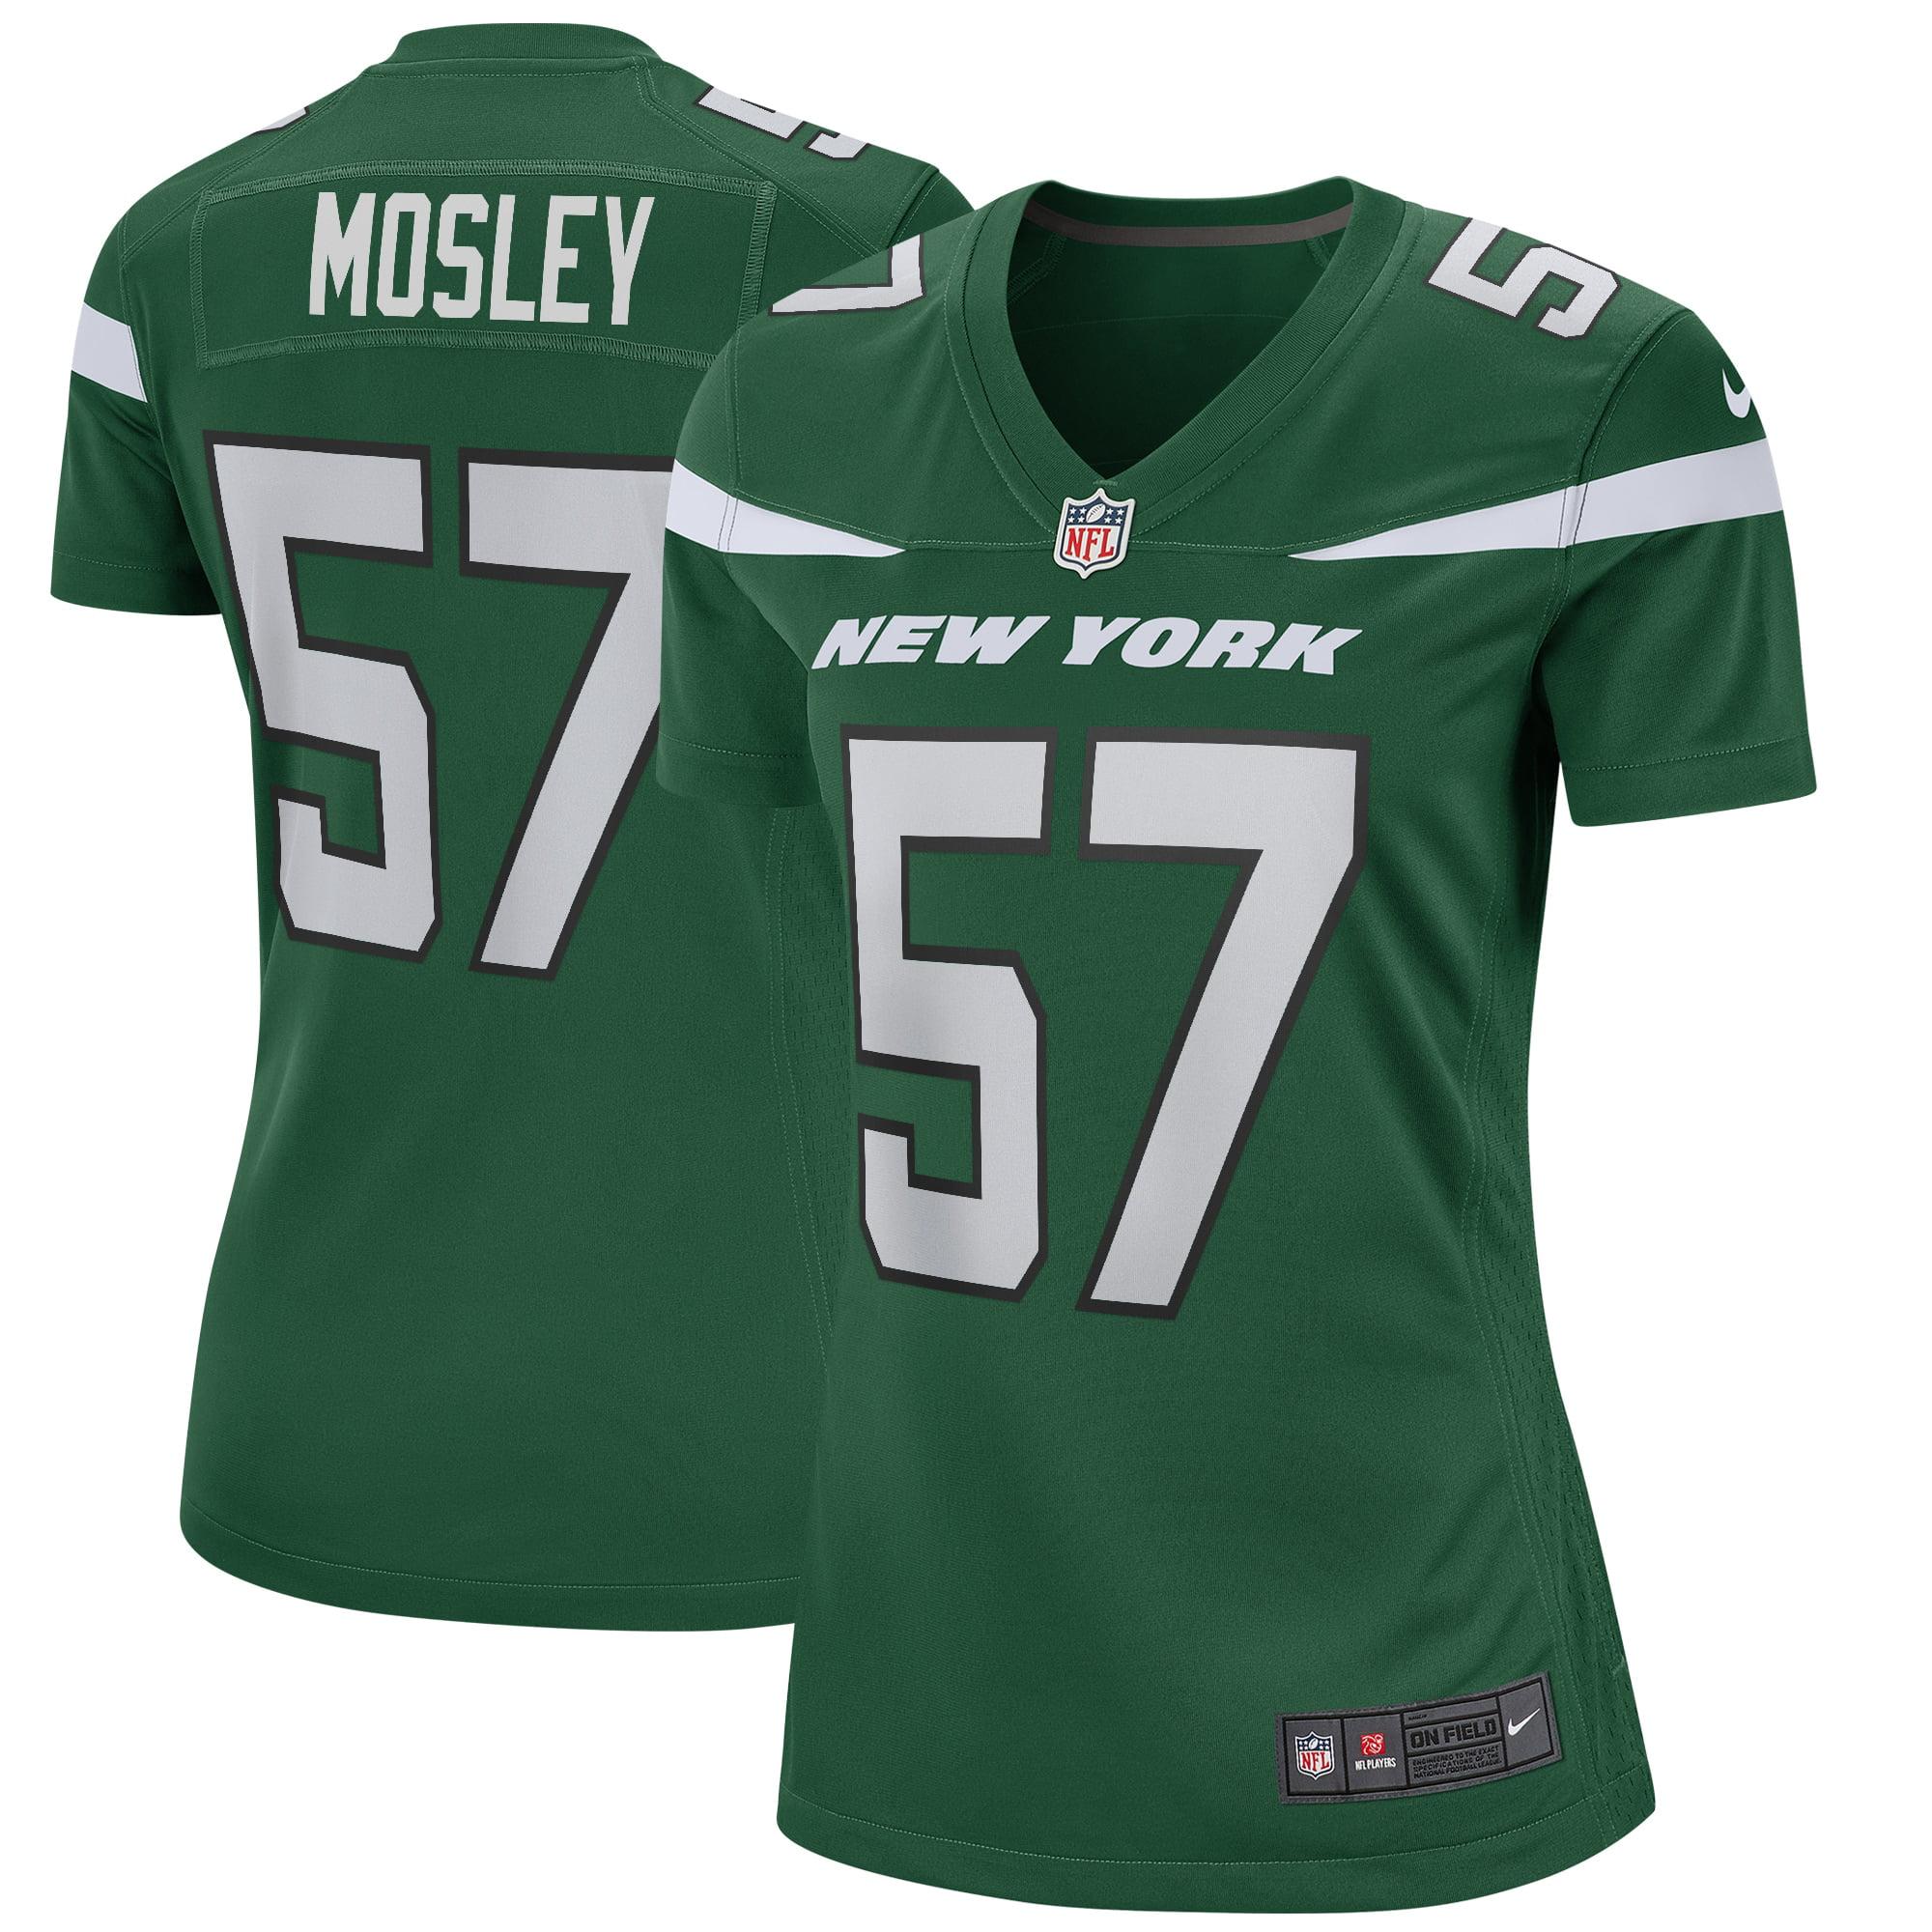 C.J. Mosley New York Jets Nike Women's Game Player Jersey - Gotham Green - Walmart.com